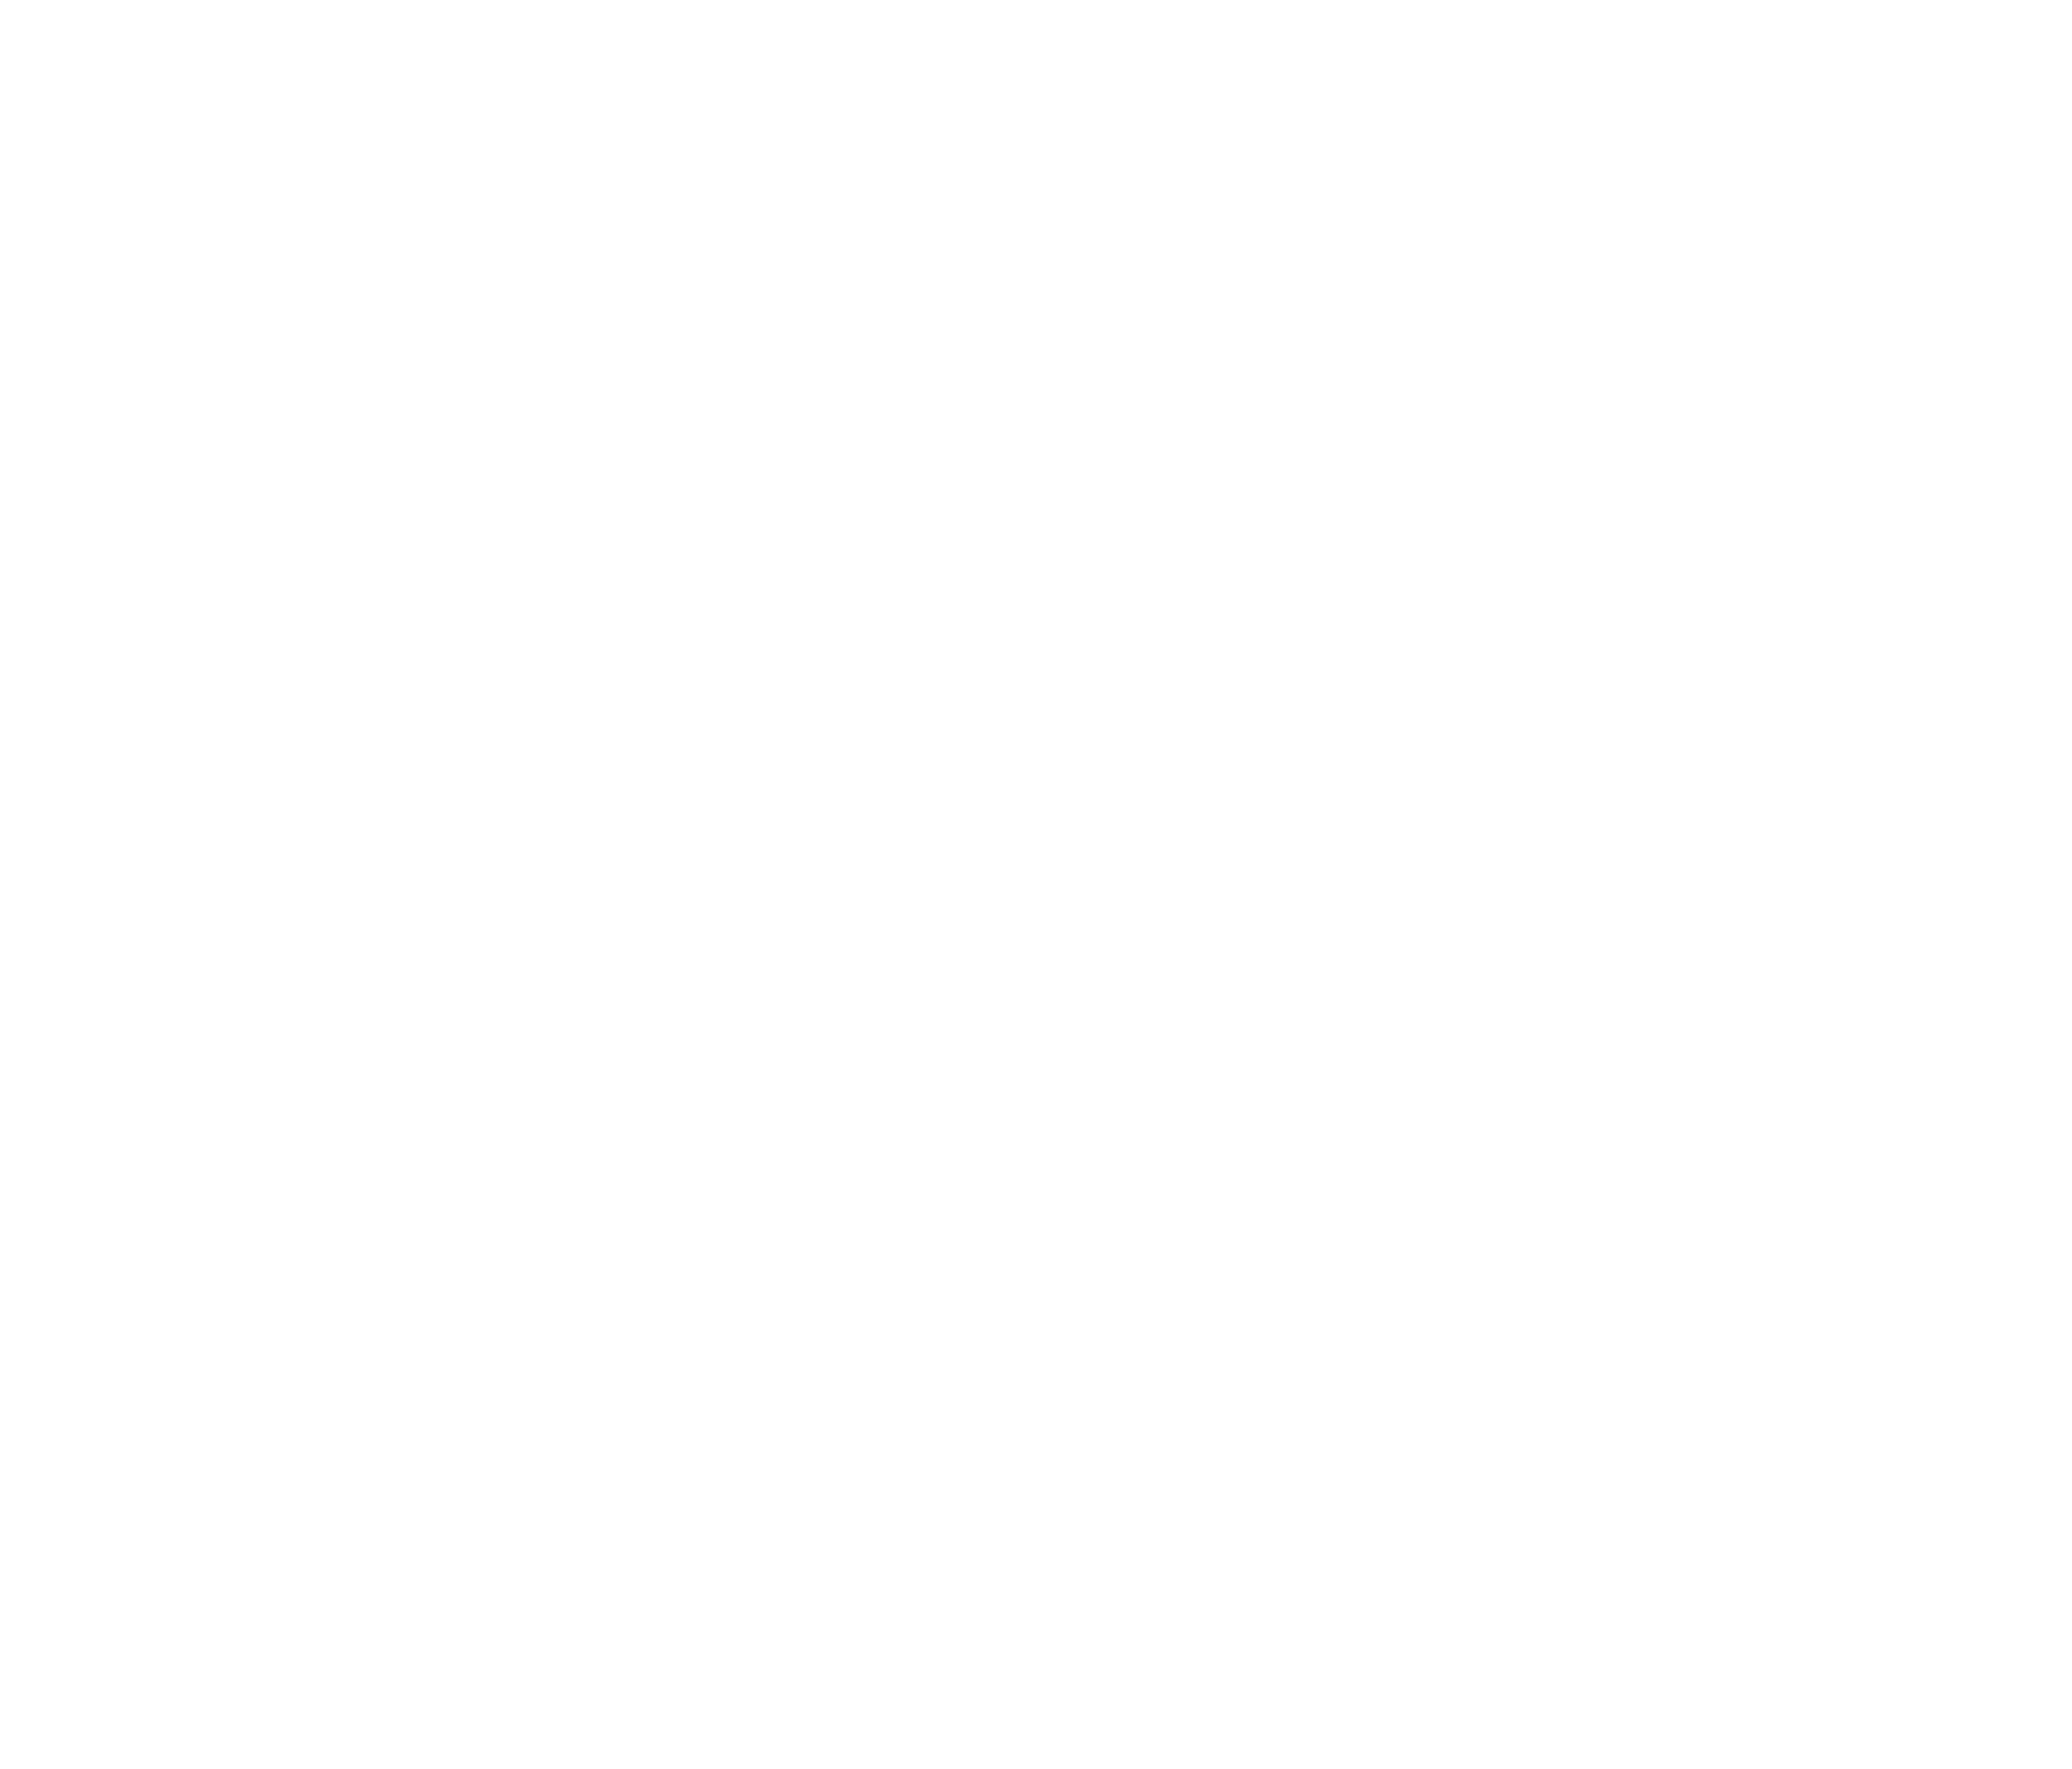 OCULUS_QUEST_Black-01_test.png